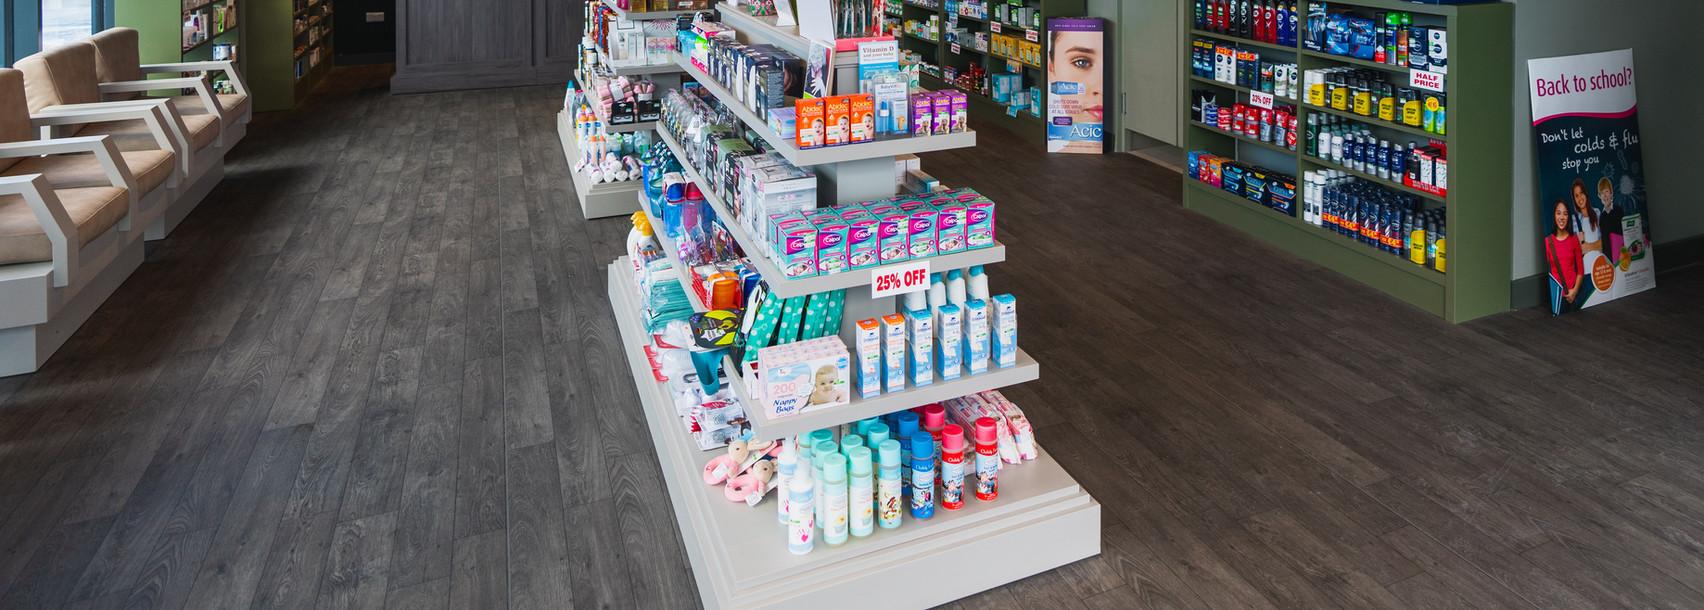 Zest Pharmacy Photos-4446.jpg